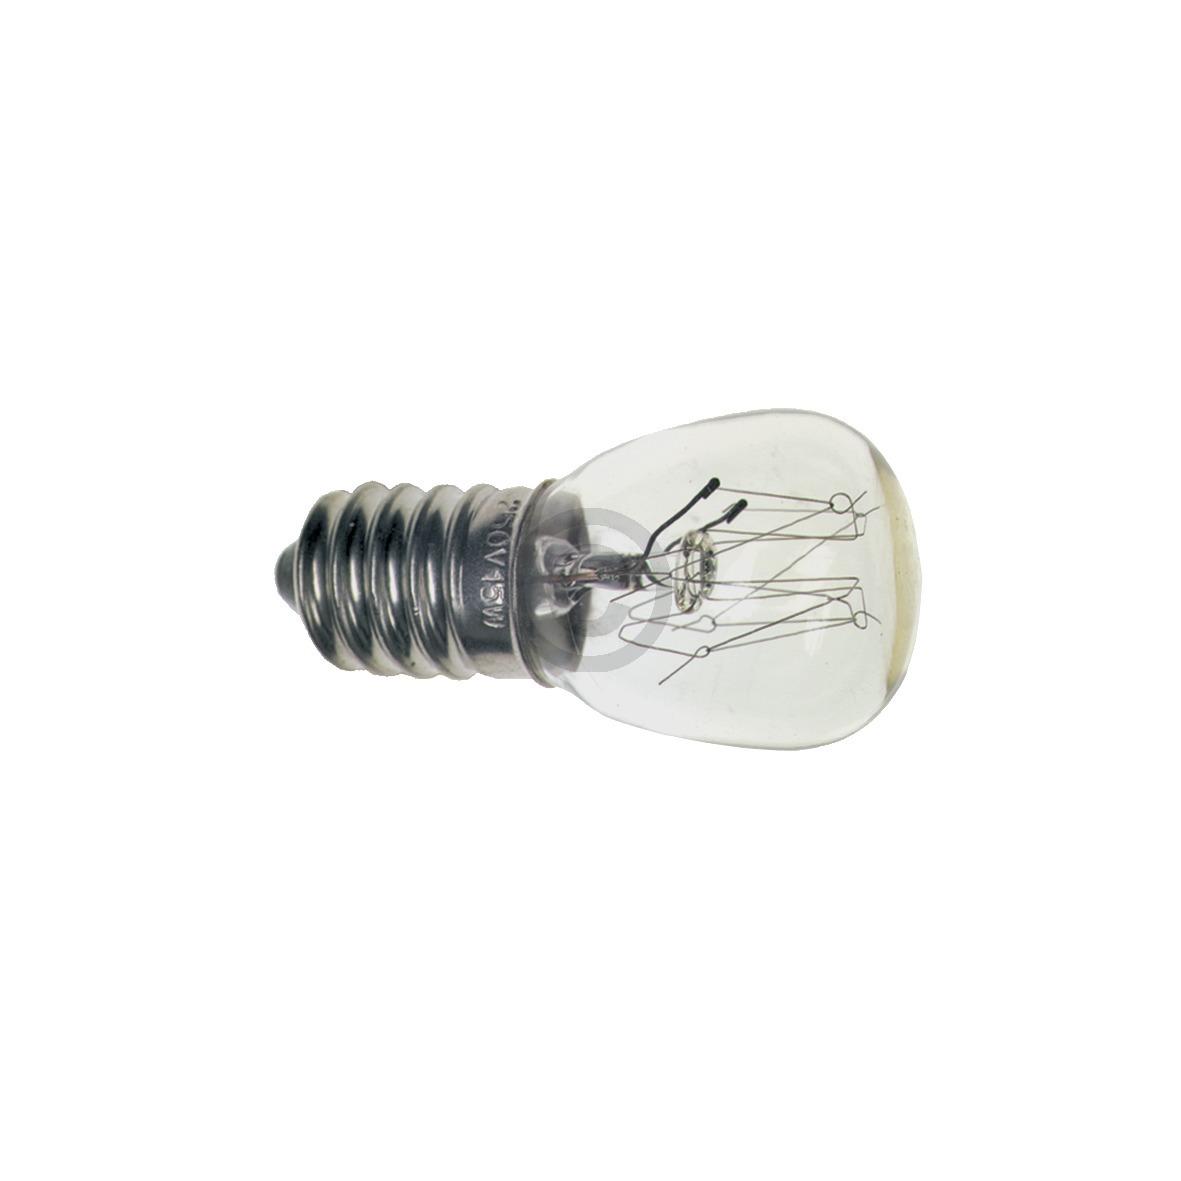 Lampe E14 15W 22mmØ 49mm 230V Universal AEG, Electrolux, Juno, Zanussi